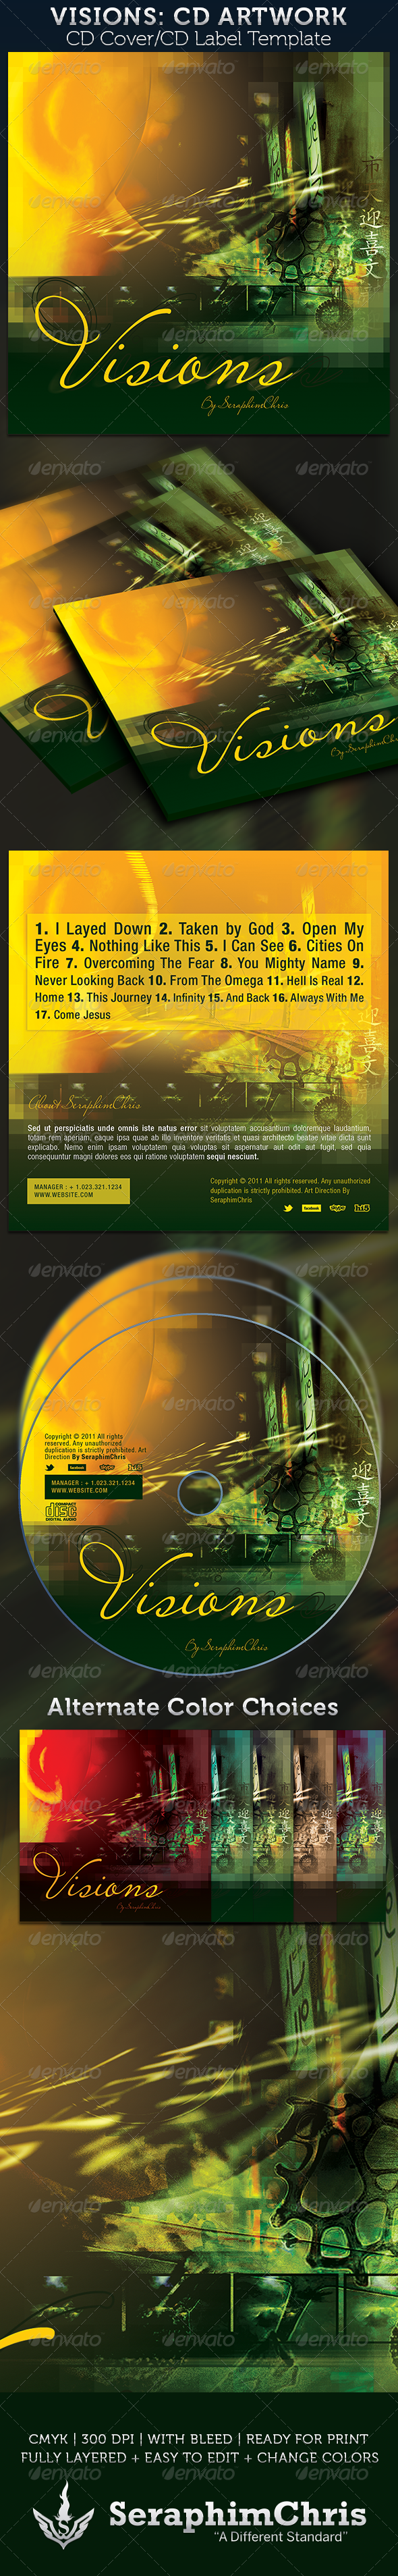 Visions CD Cover Artwork Template - CD & DVD Artwork Print Templates